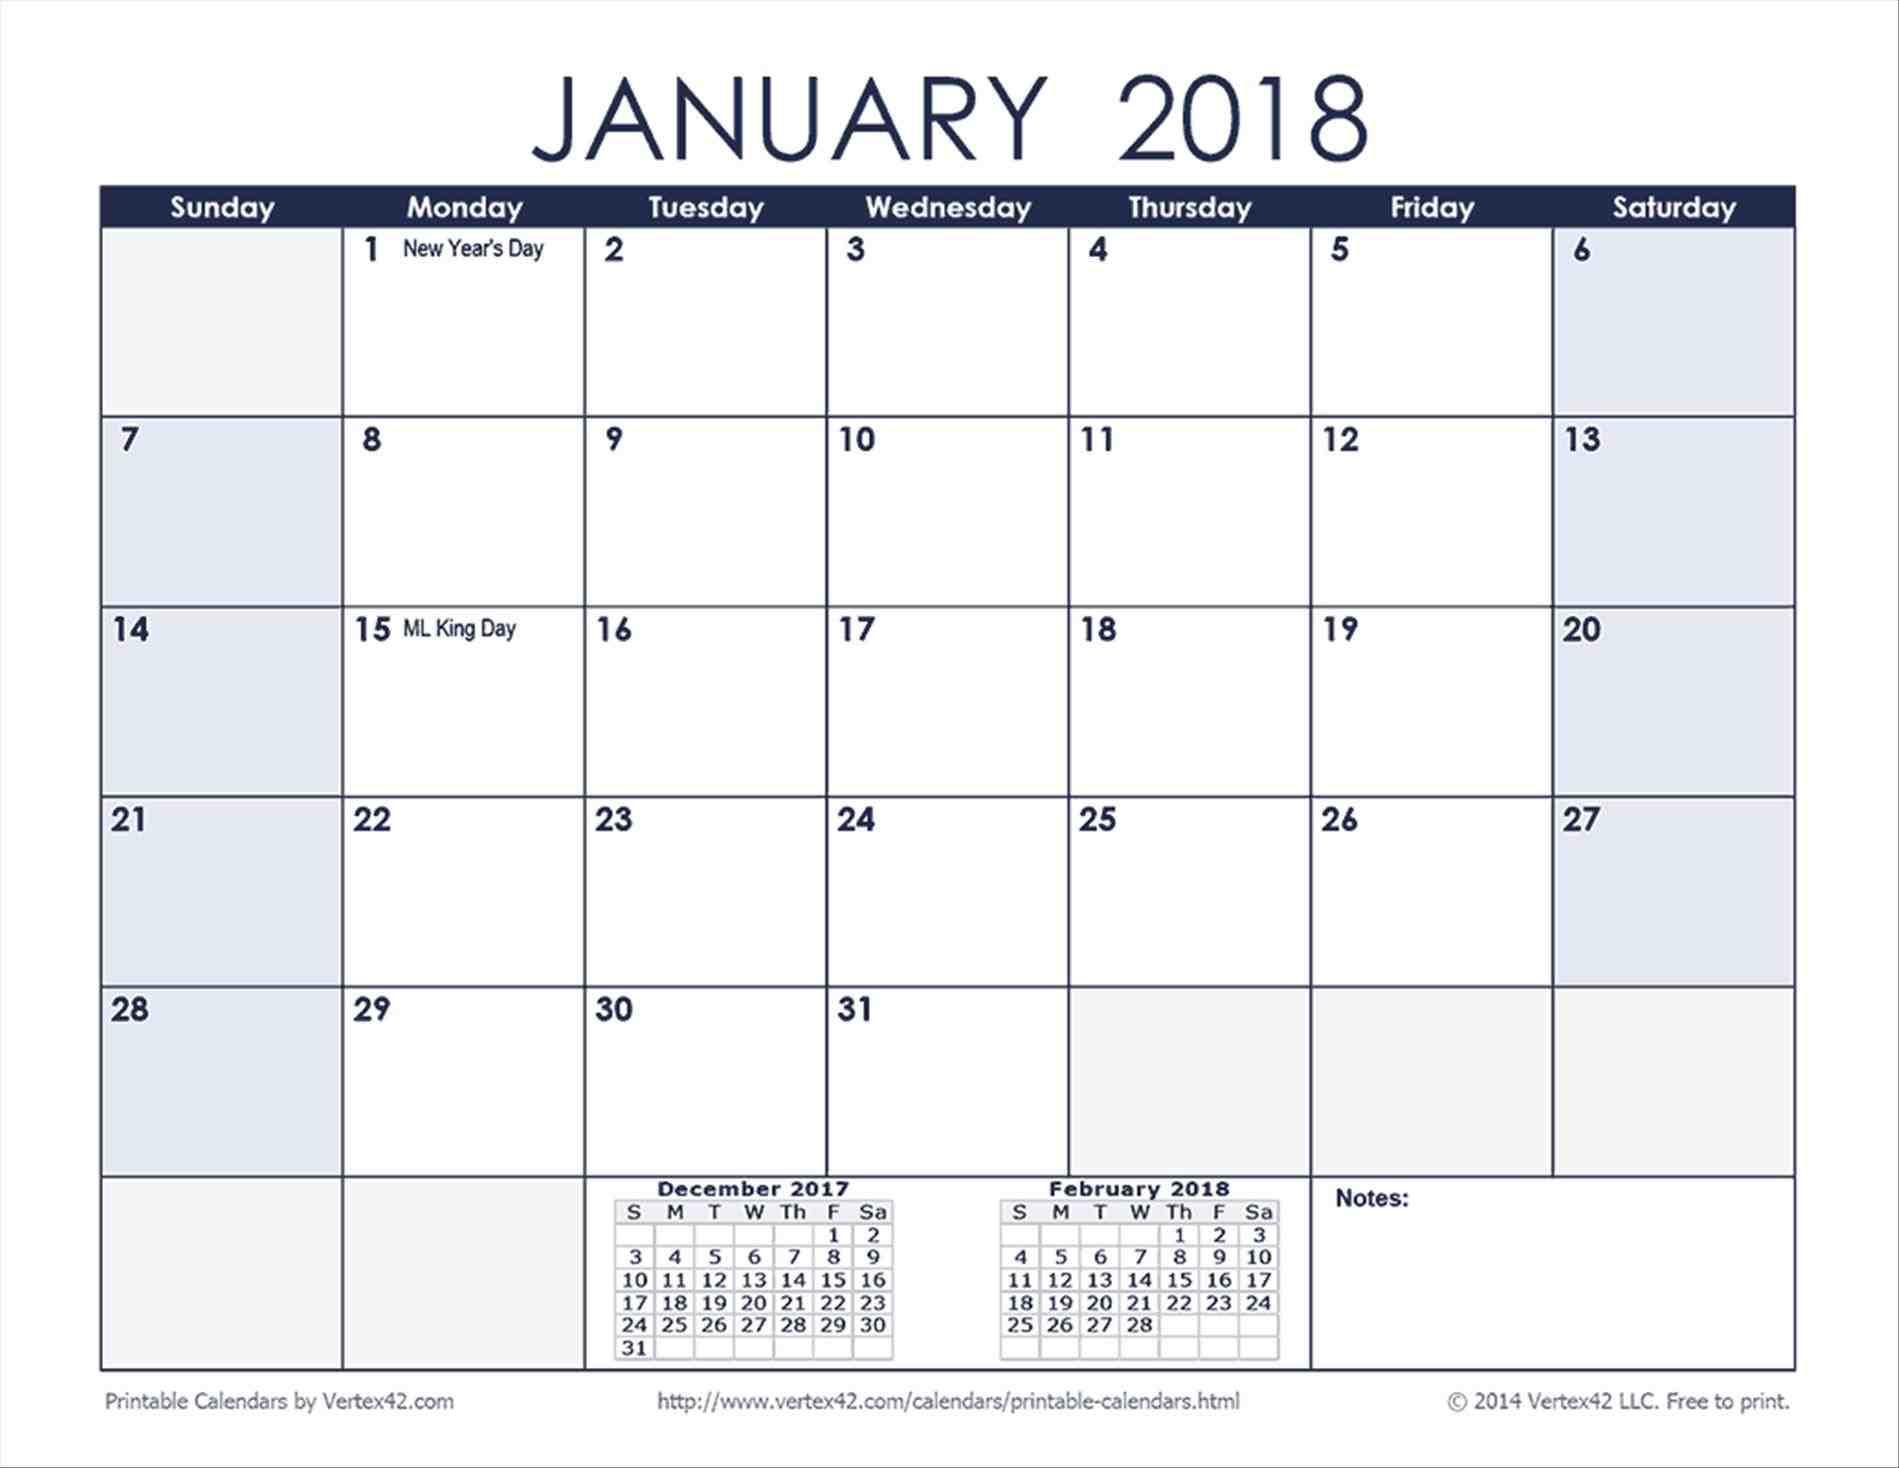 calendar templates time calendar alannoscrapleftbehindcorhalannoscrapleftbehindco free top 5 resources to get free weekly calendar templates printable